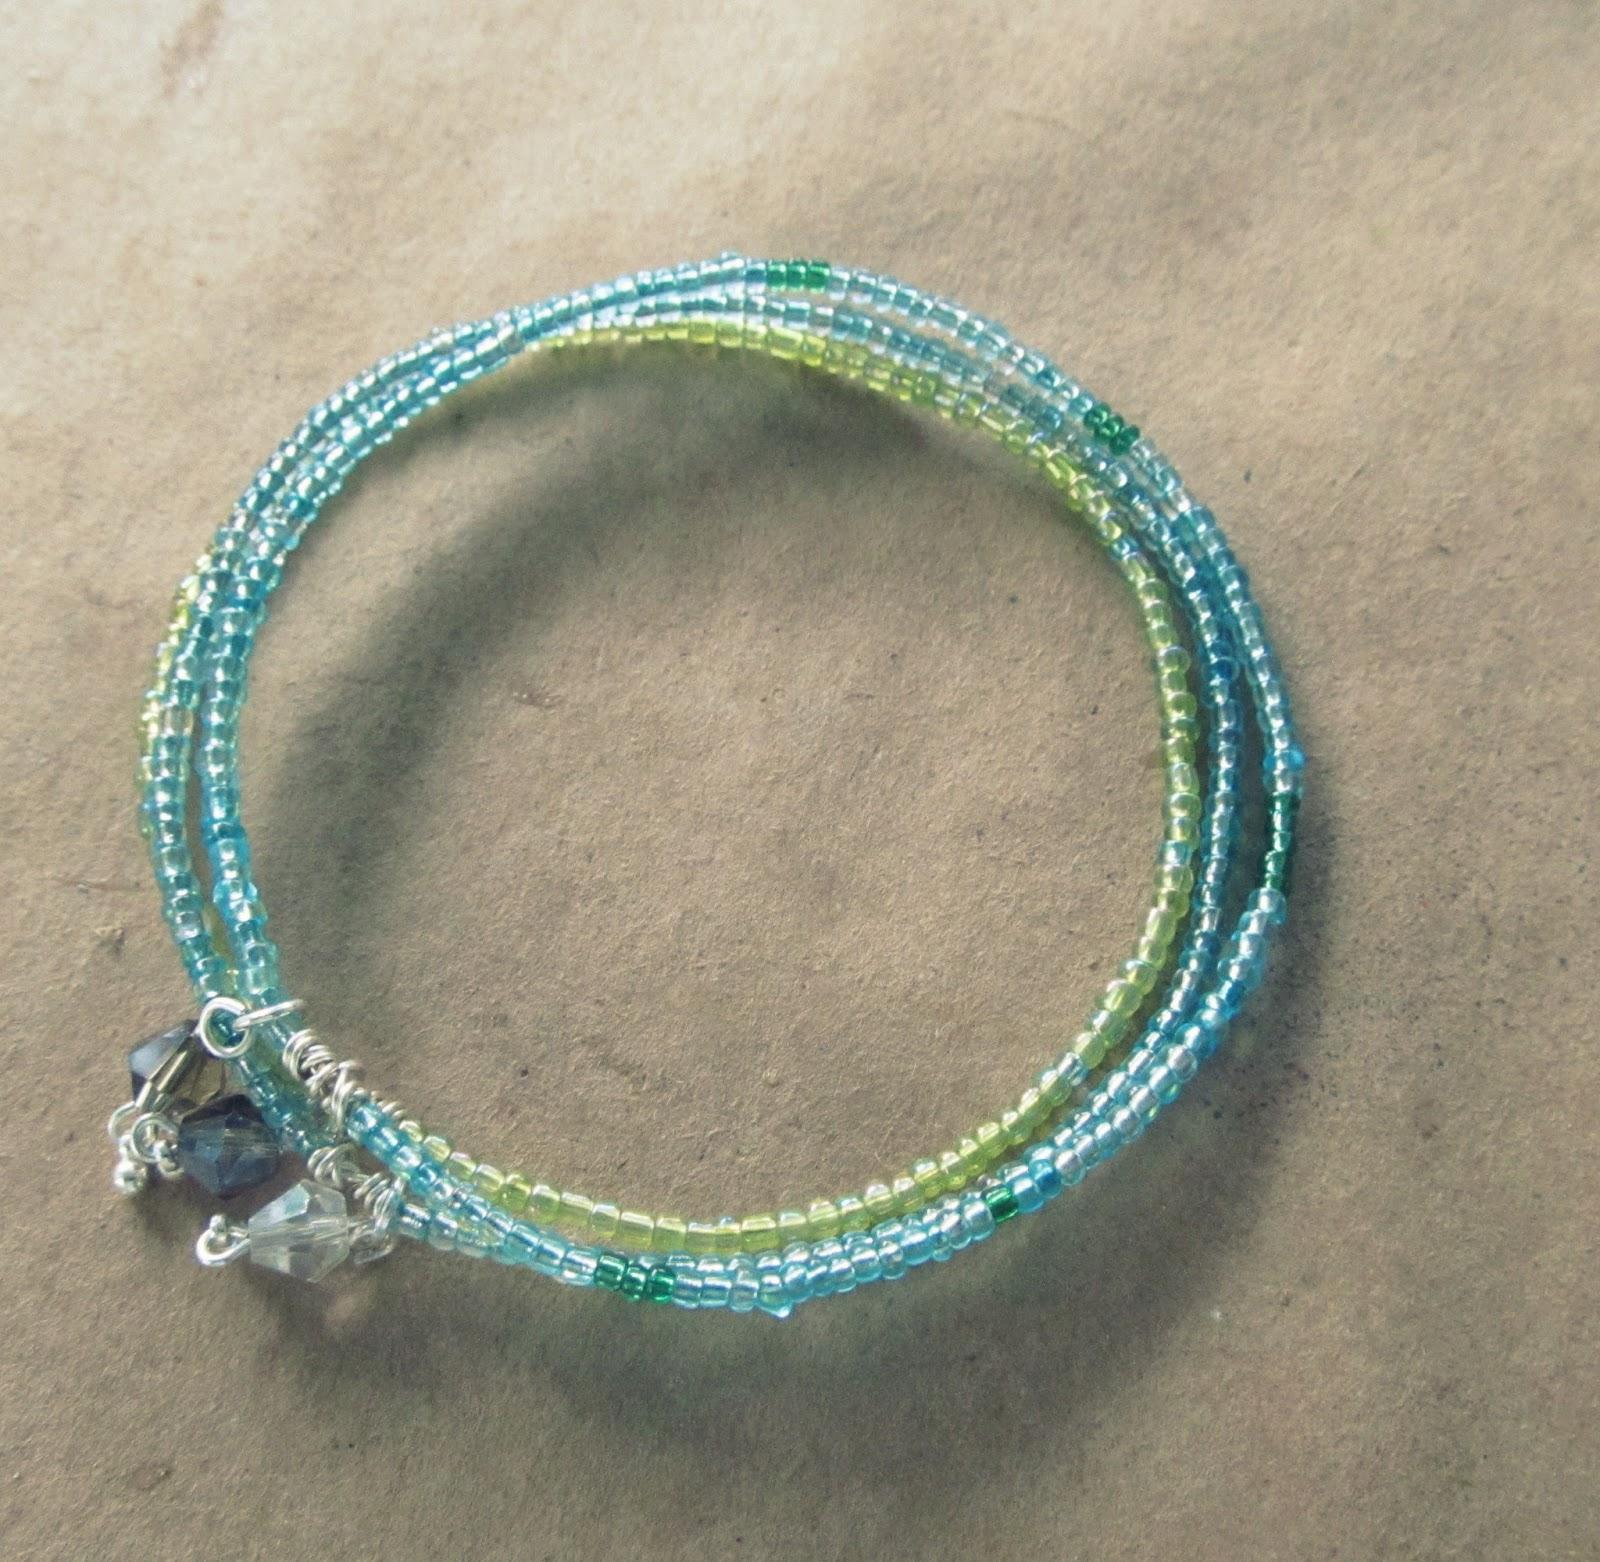 wobisobi seed bead bangle bracelet diy